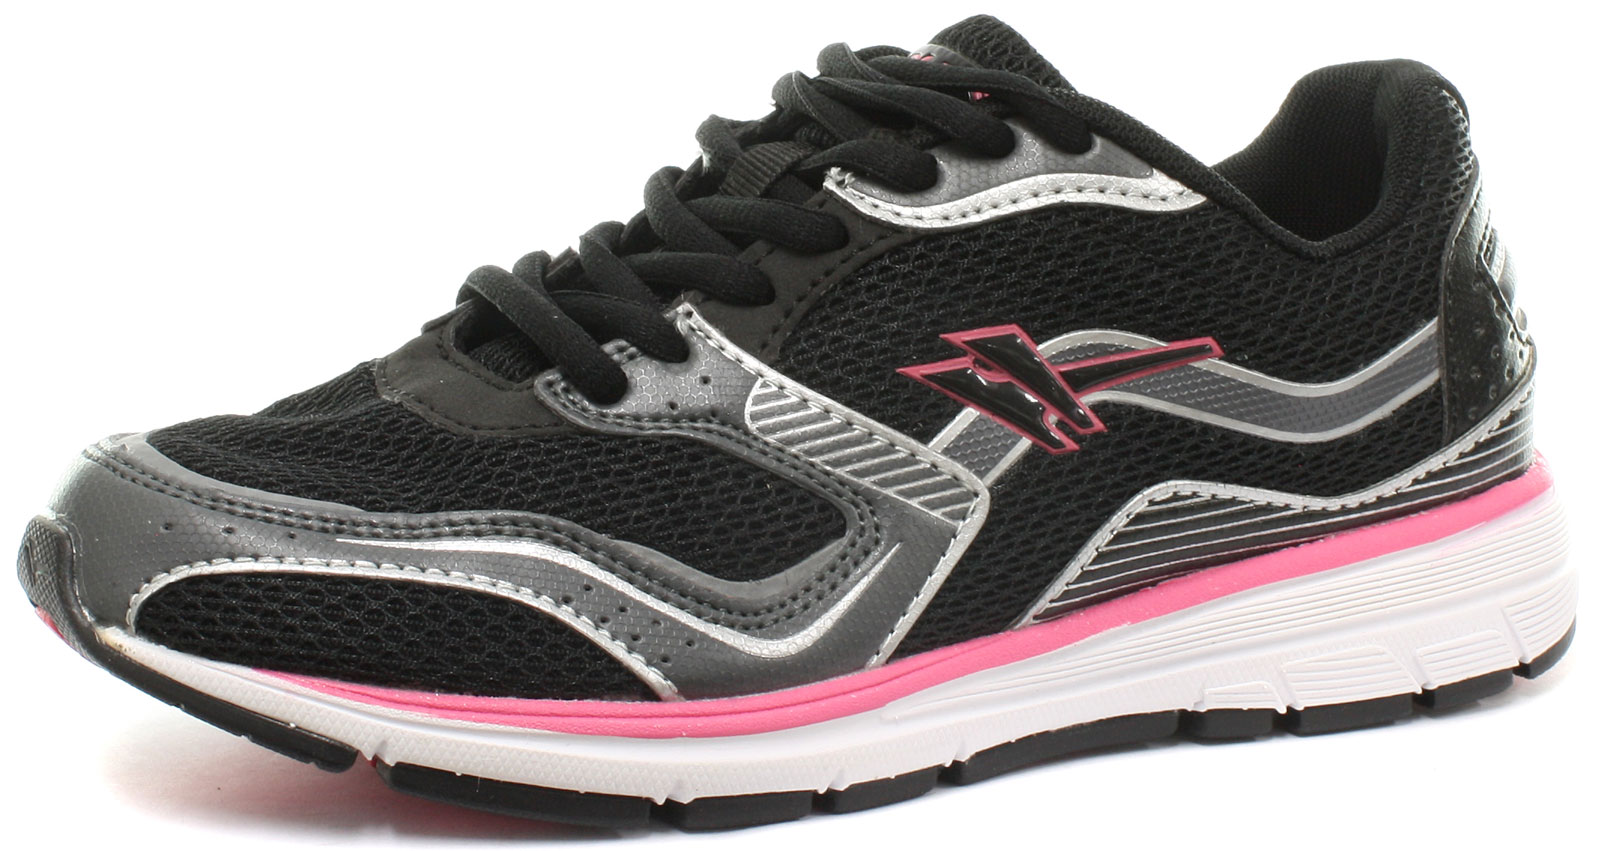 New Gola Active talla LT Speed negro Mujer Fitness/corriendo Trainers talla Active 8efa0b